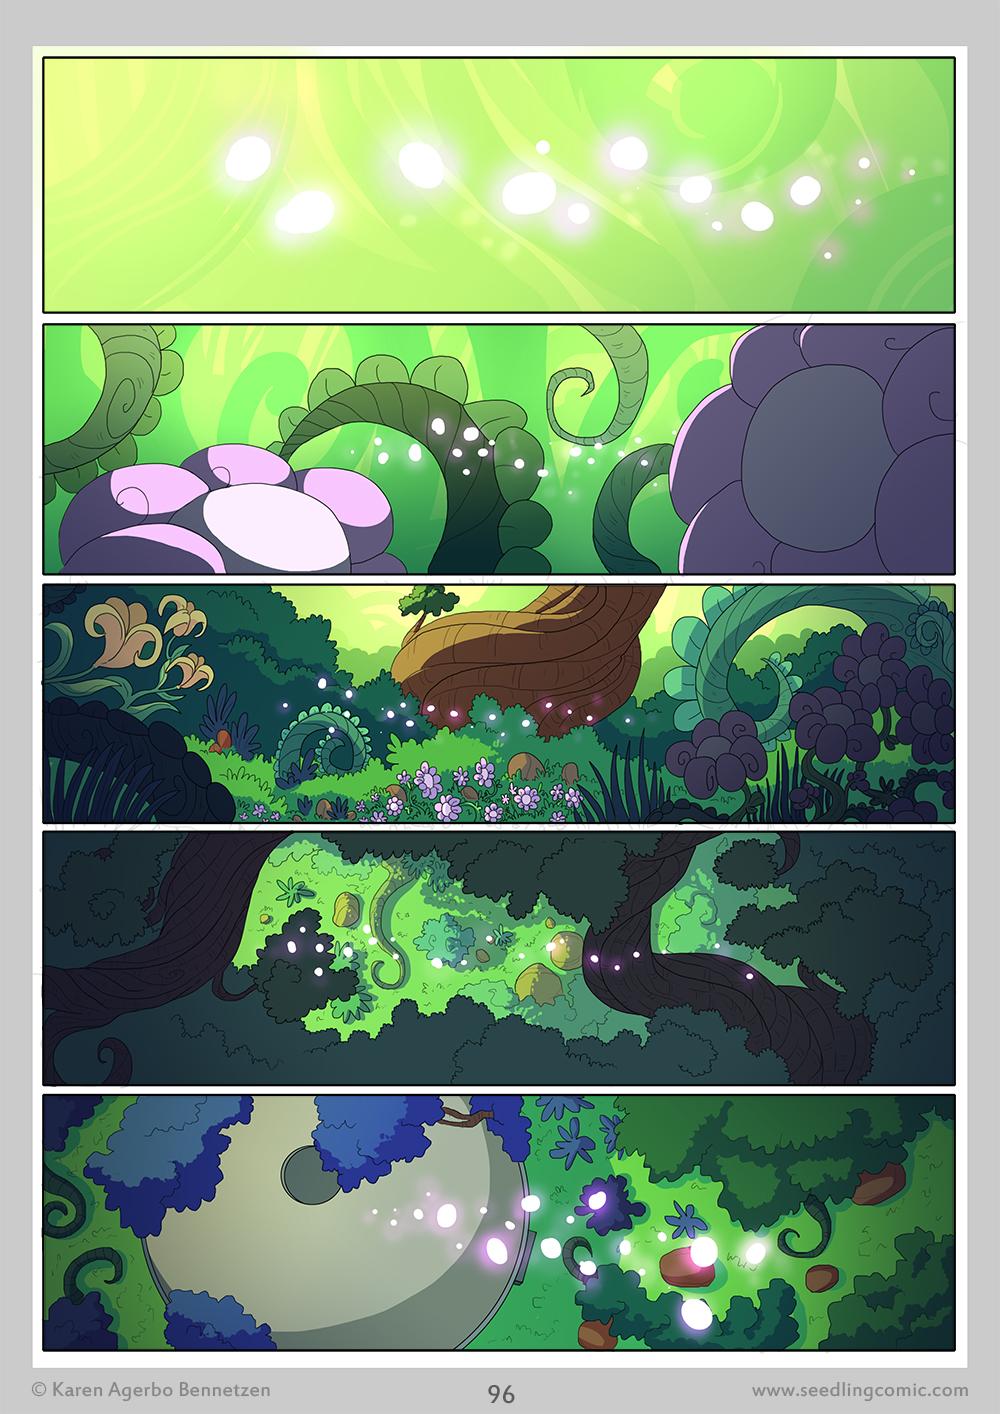 Return of the glowy spores